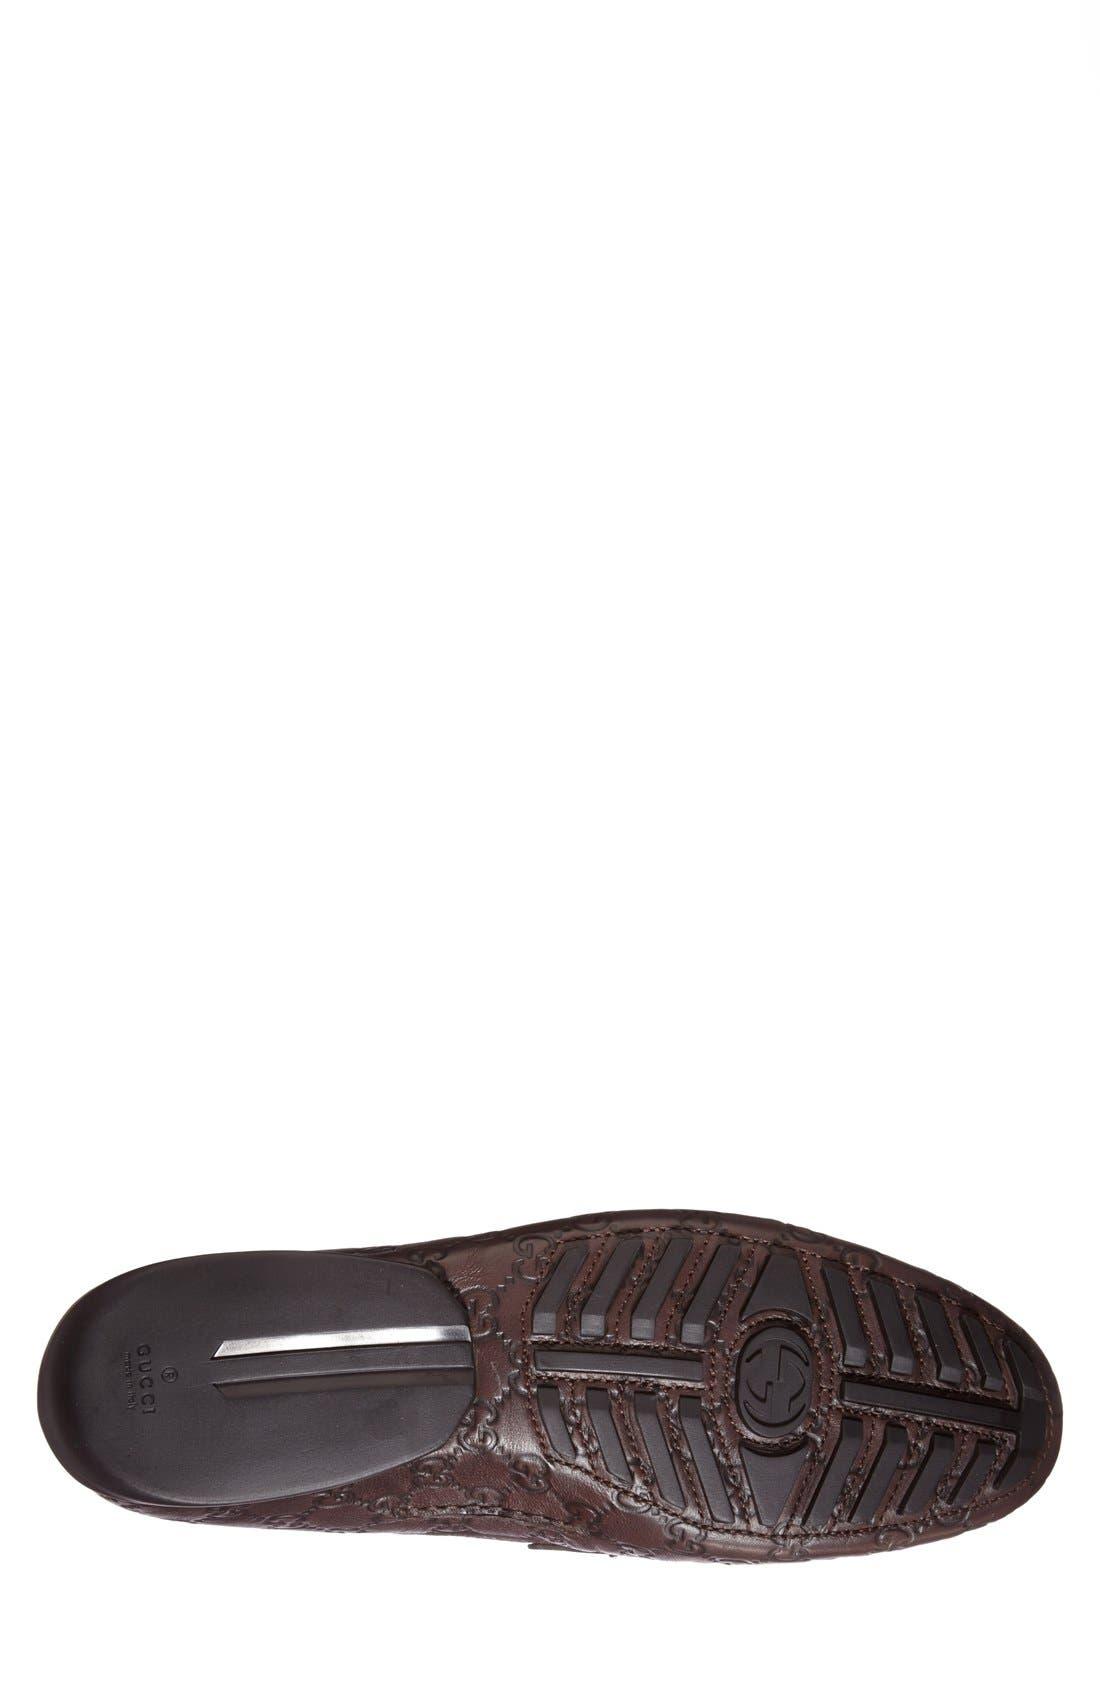 San Marino Driving Shoe,                             Alternate thumbnail 4, color,                             Dark Chocolate